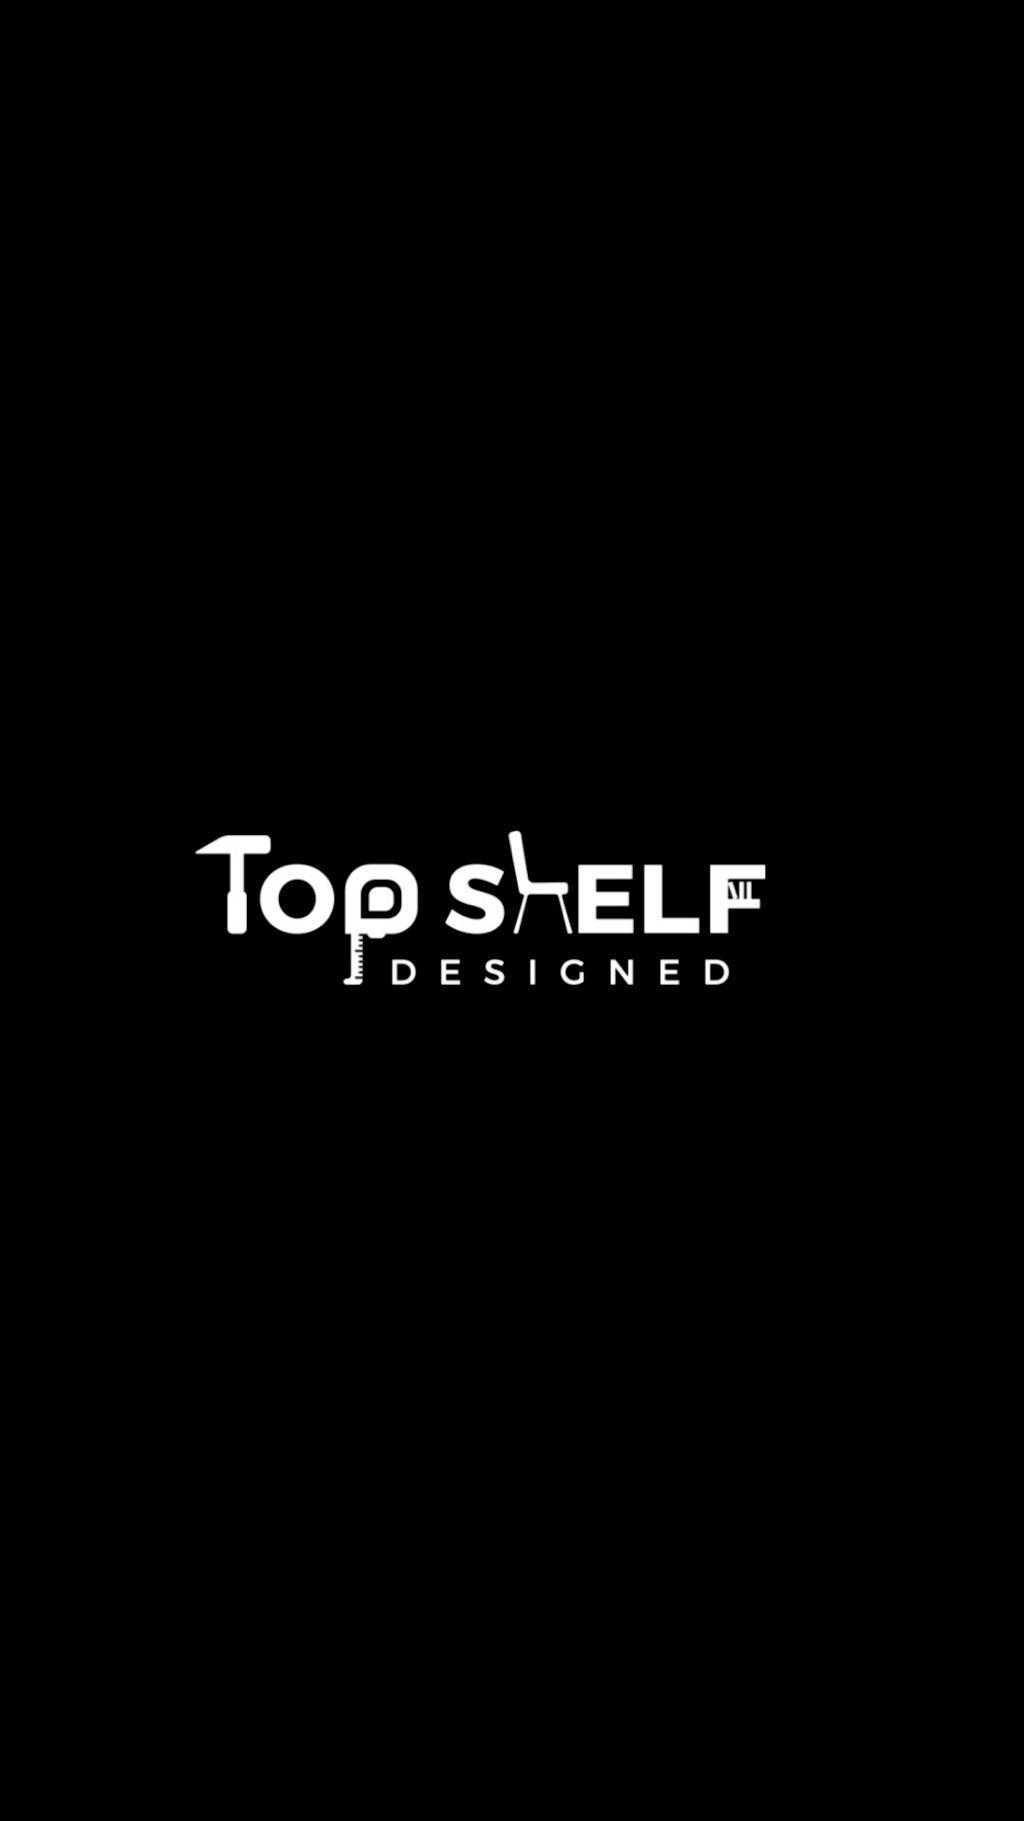 TopShelf Designed